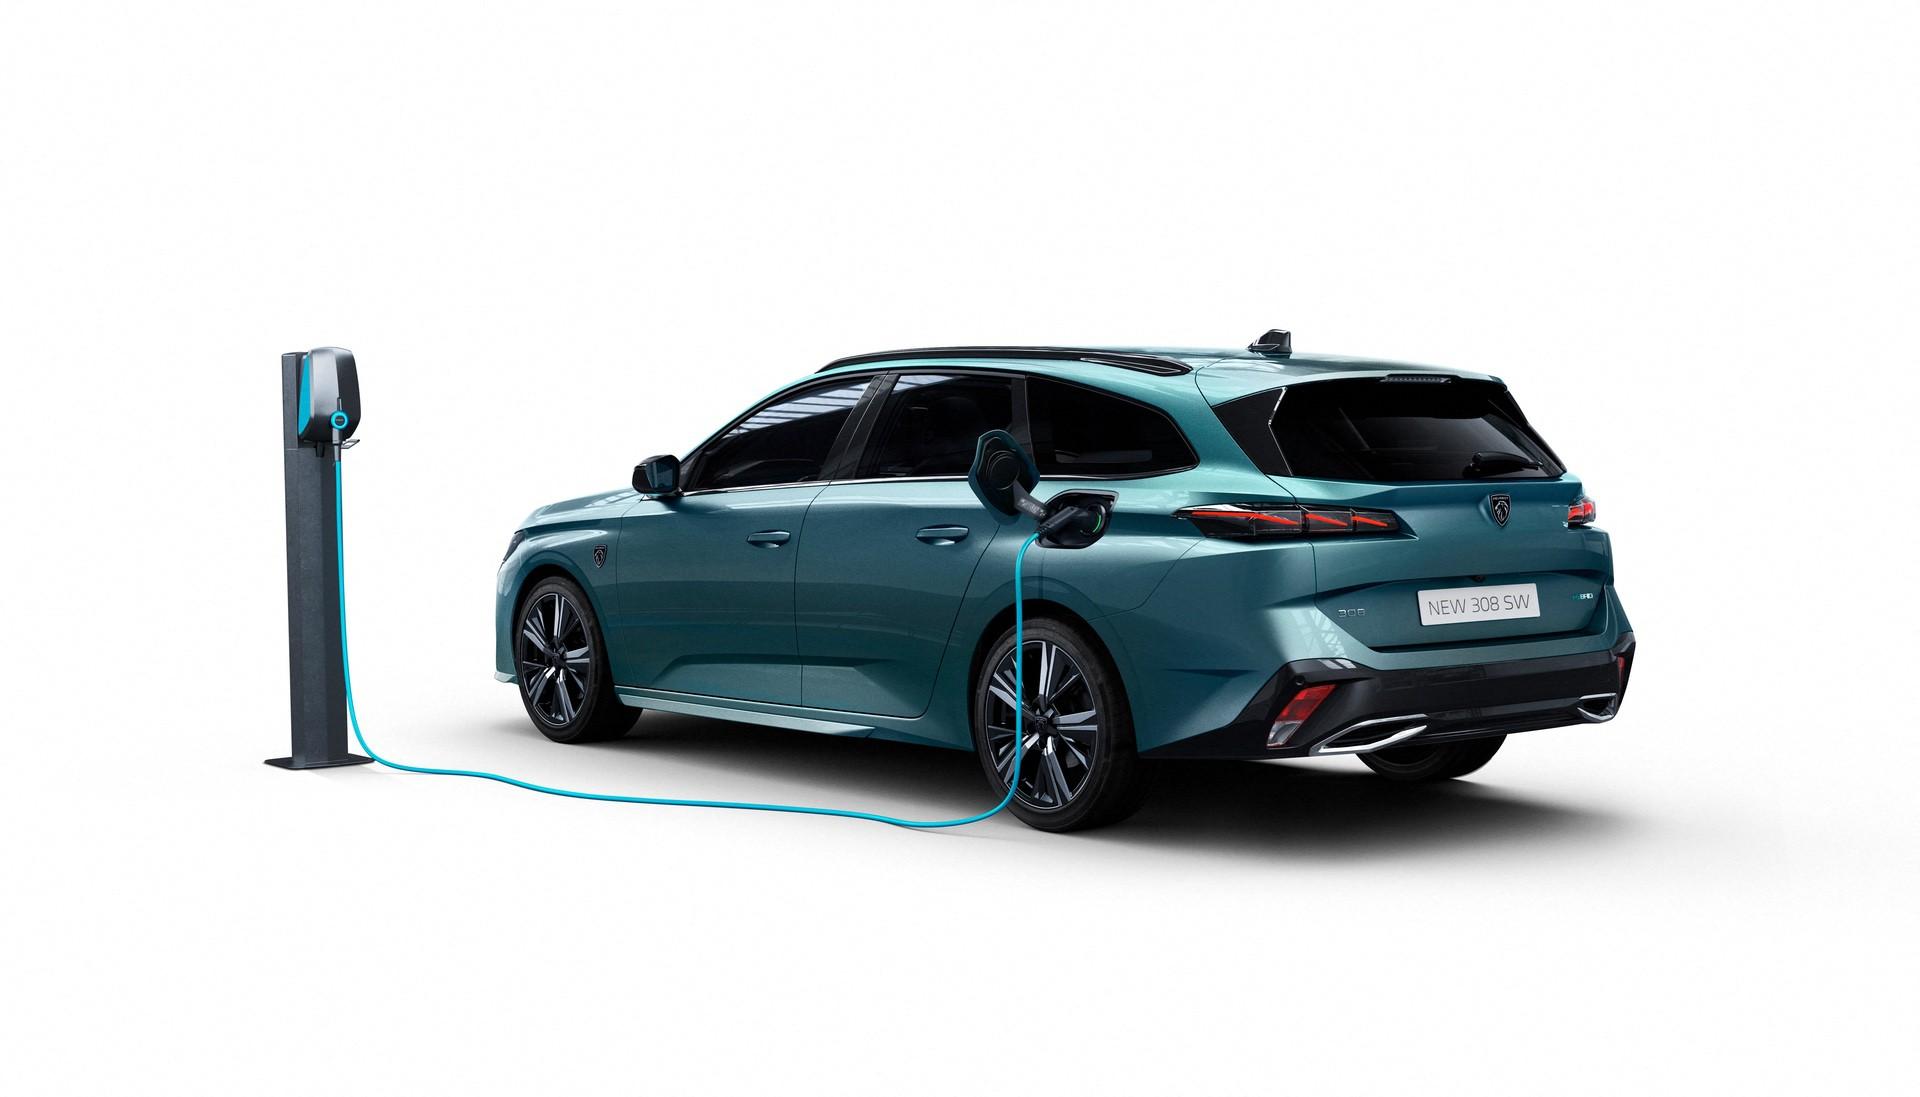 2022_Peugeot_308_SW-0015